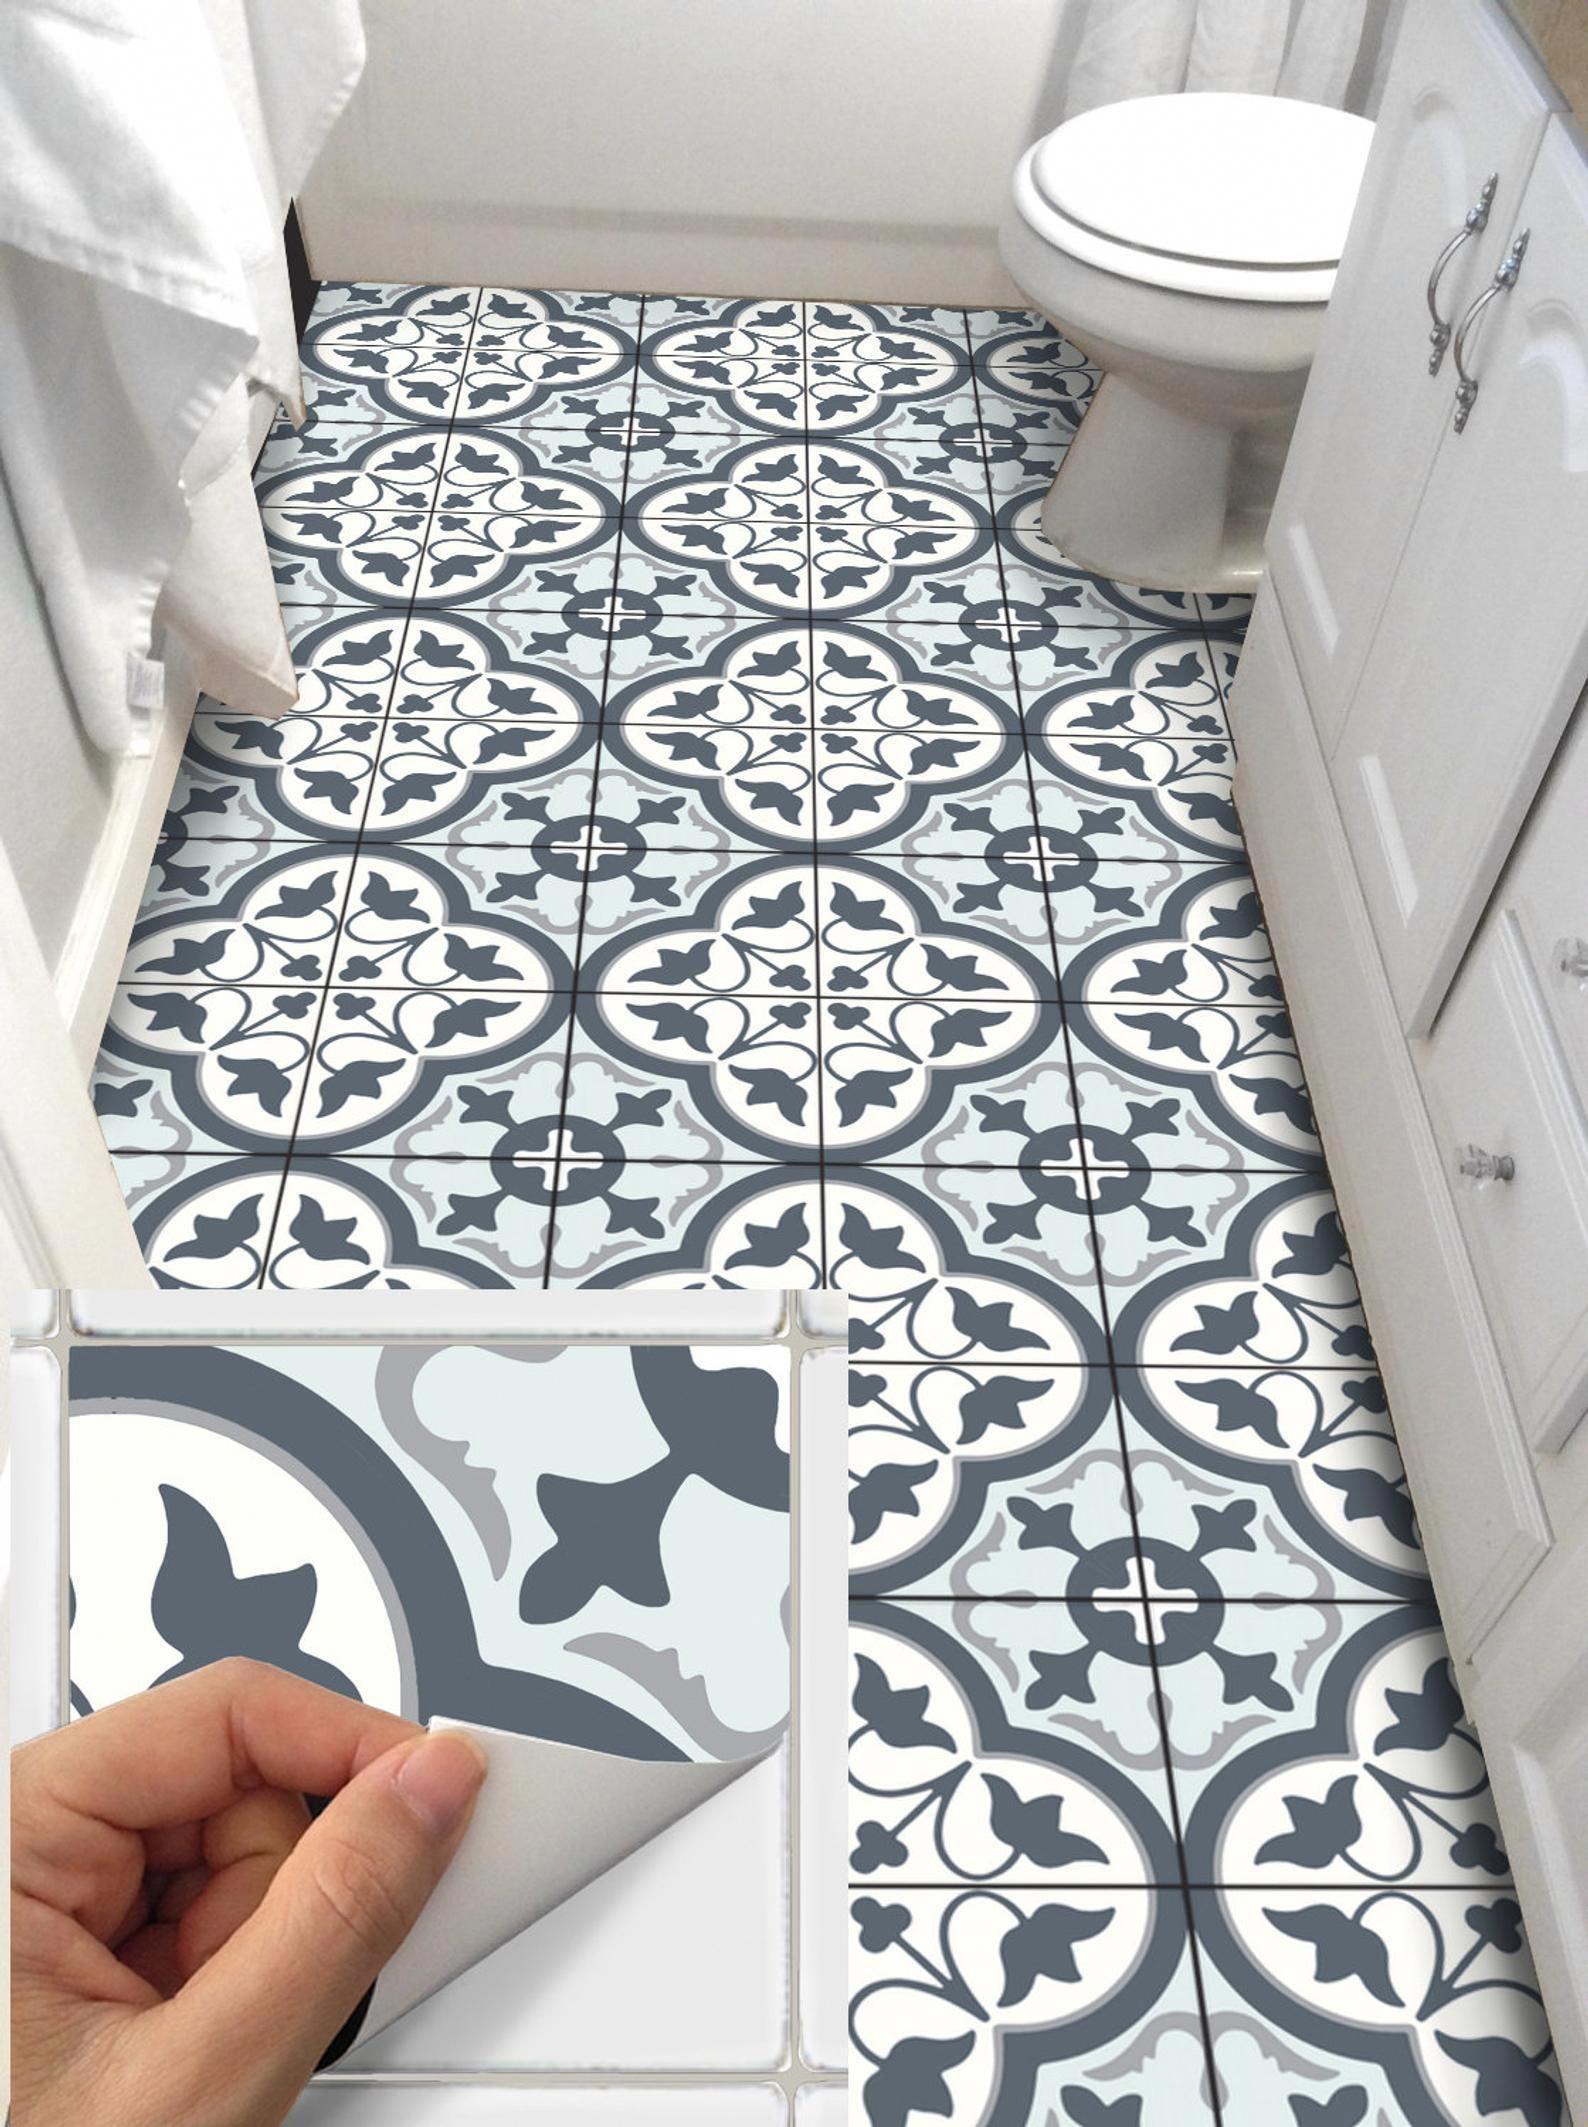 Tile Sticker Kitchen Bath Floor Wall Waterproof Removable Peel N Stick A78q Tile Stickers Kitchen Wall Waterproofing Flooring